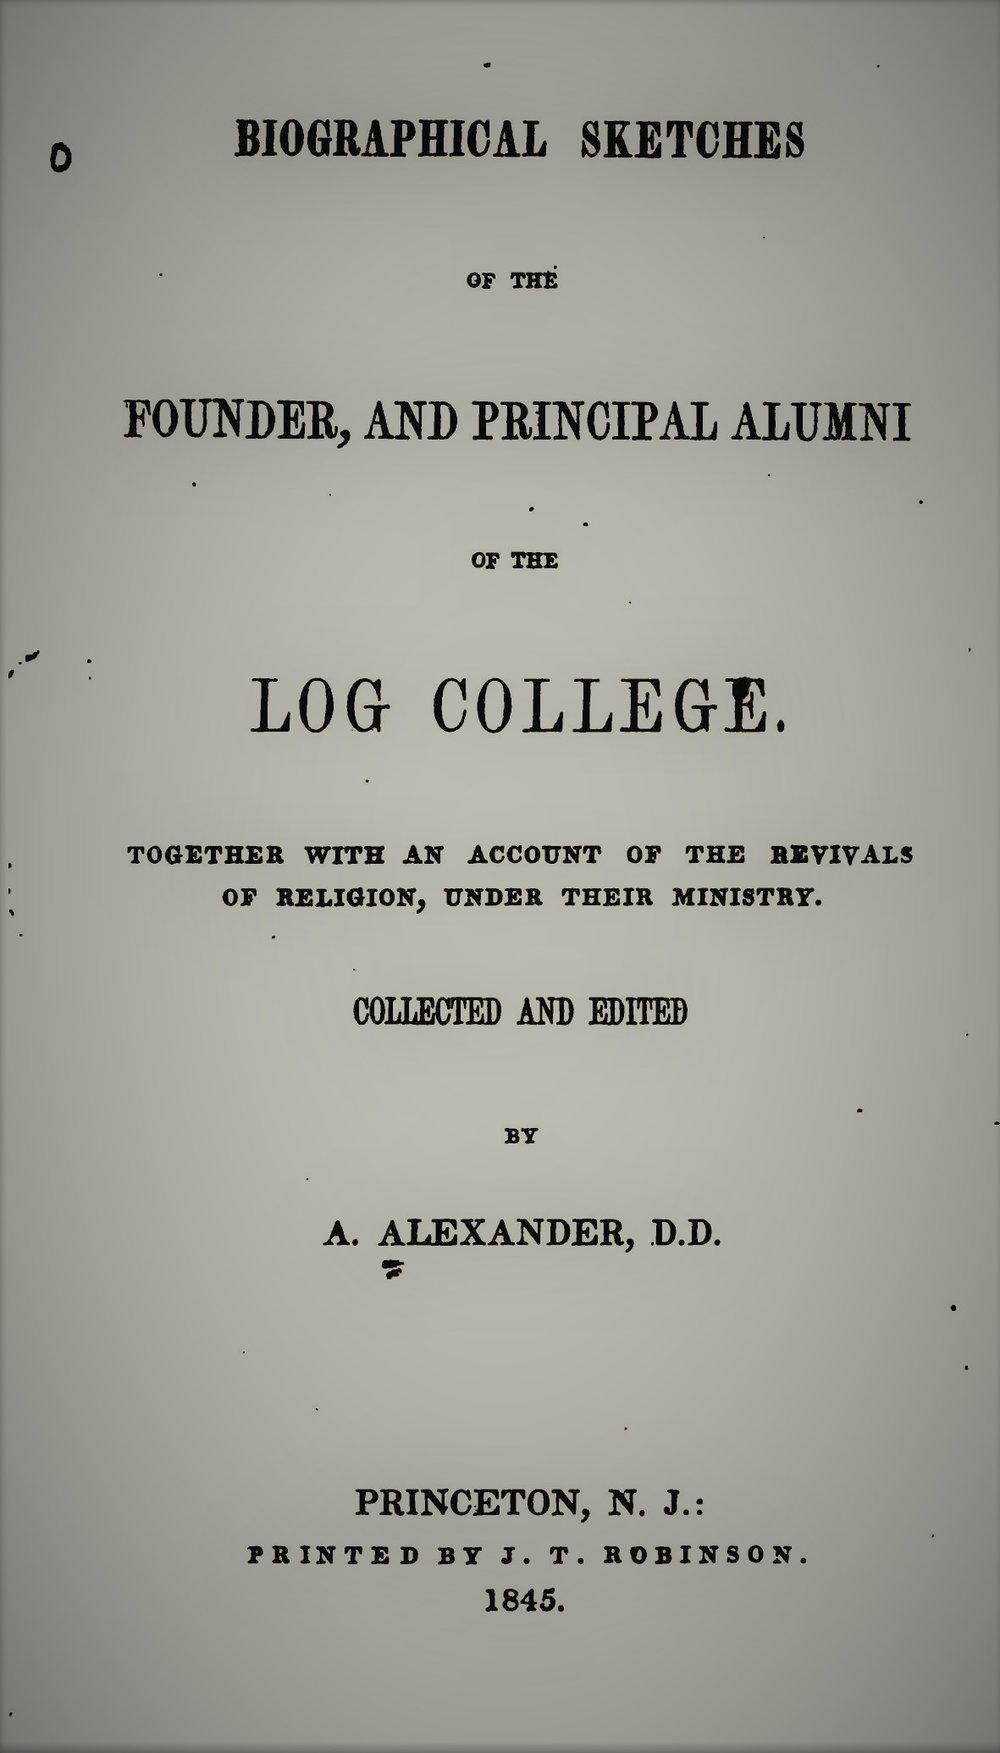 Alexander, Sketches of Log College.jpg